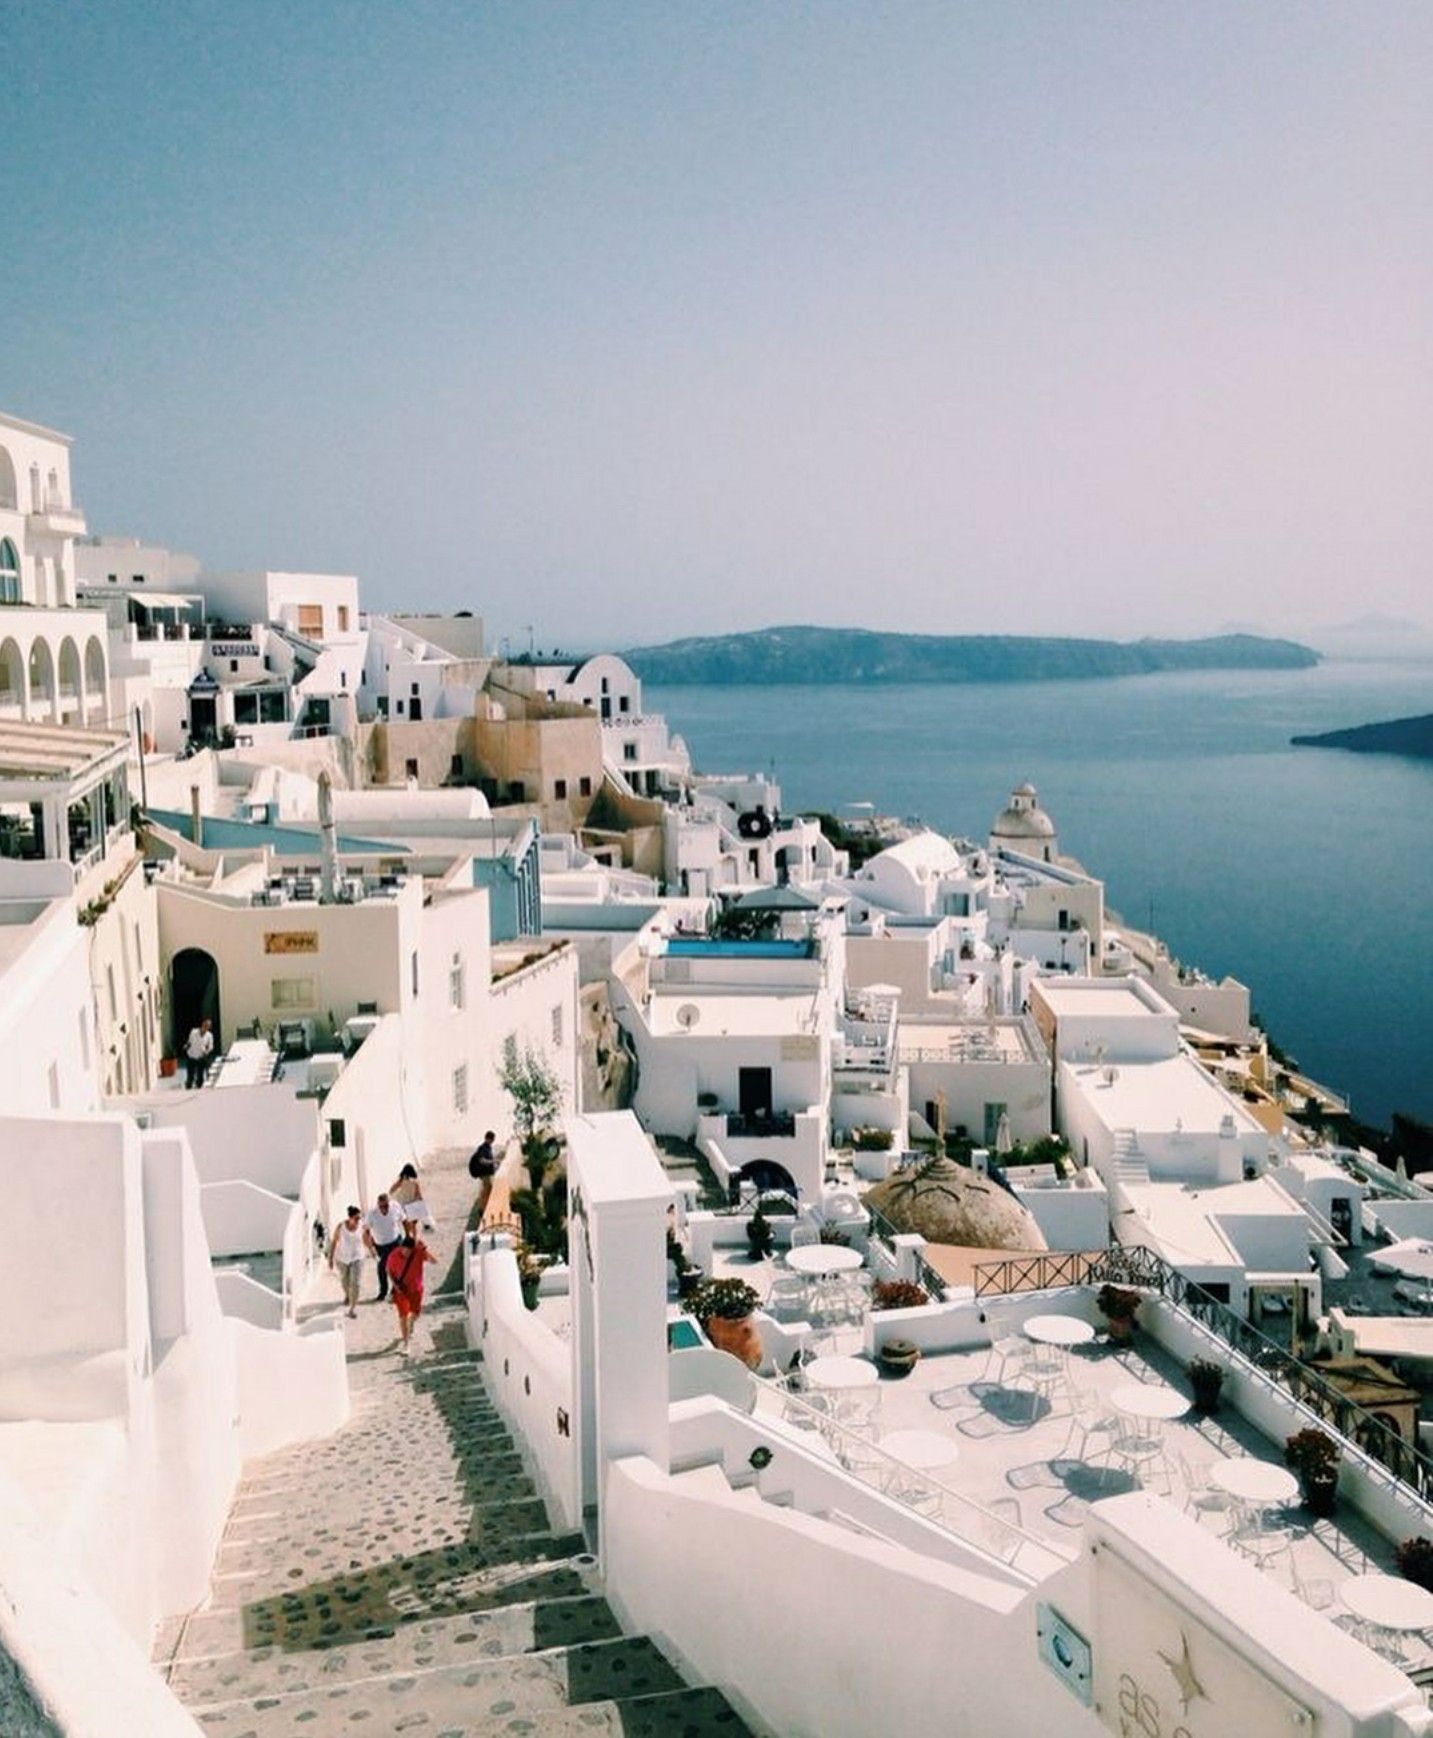 Greece Greek Landscape Europe Explore Traveler Profile Travels Profile Destination Escape Summer Greece Travel Dream Vacations Places To Travel